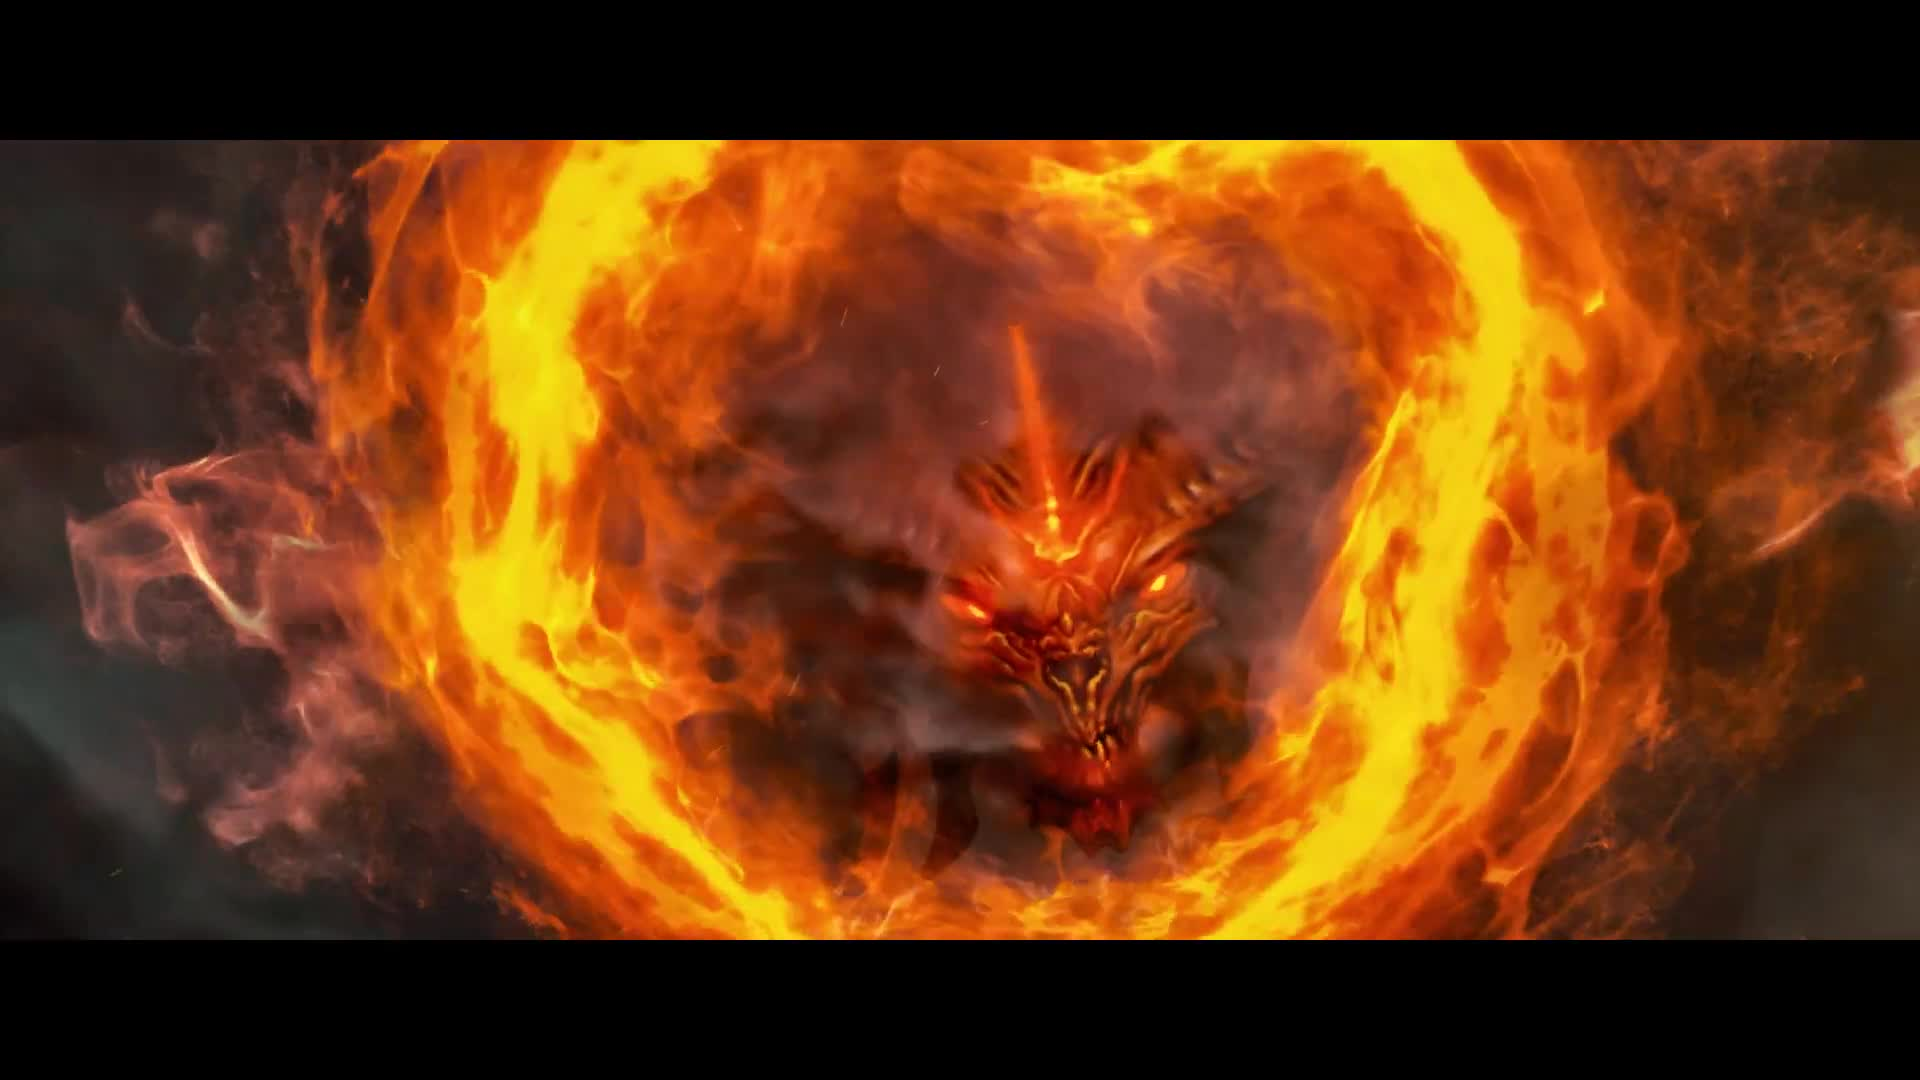 Trailer, Nintendo, Rollenspiel, Blizzard, Nintendo Switch, Diablo 3, Diablo, diablo III, Eternal Collection